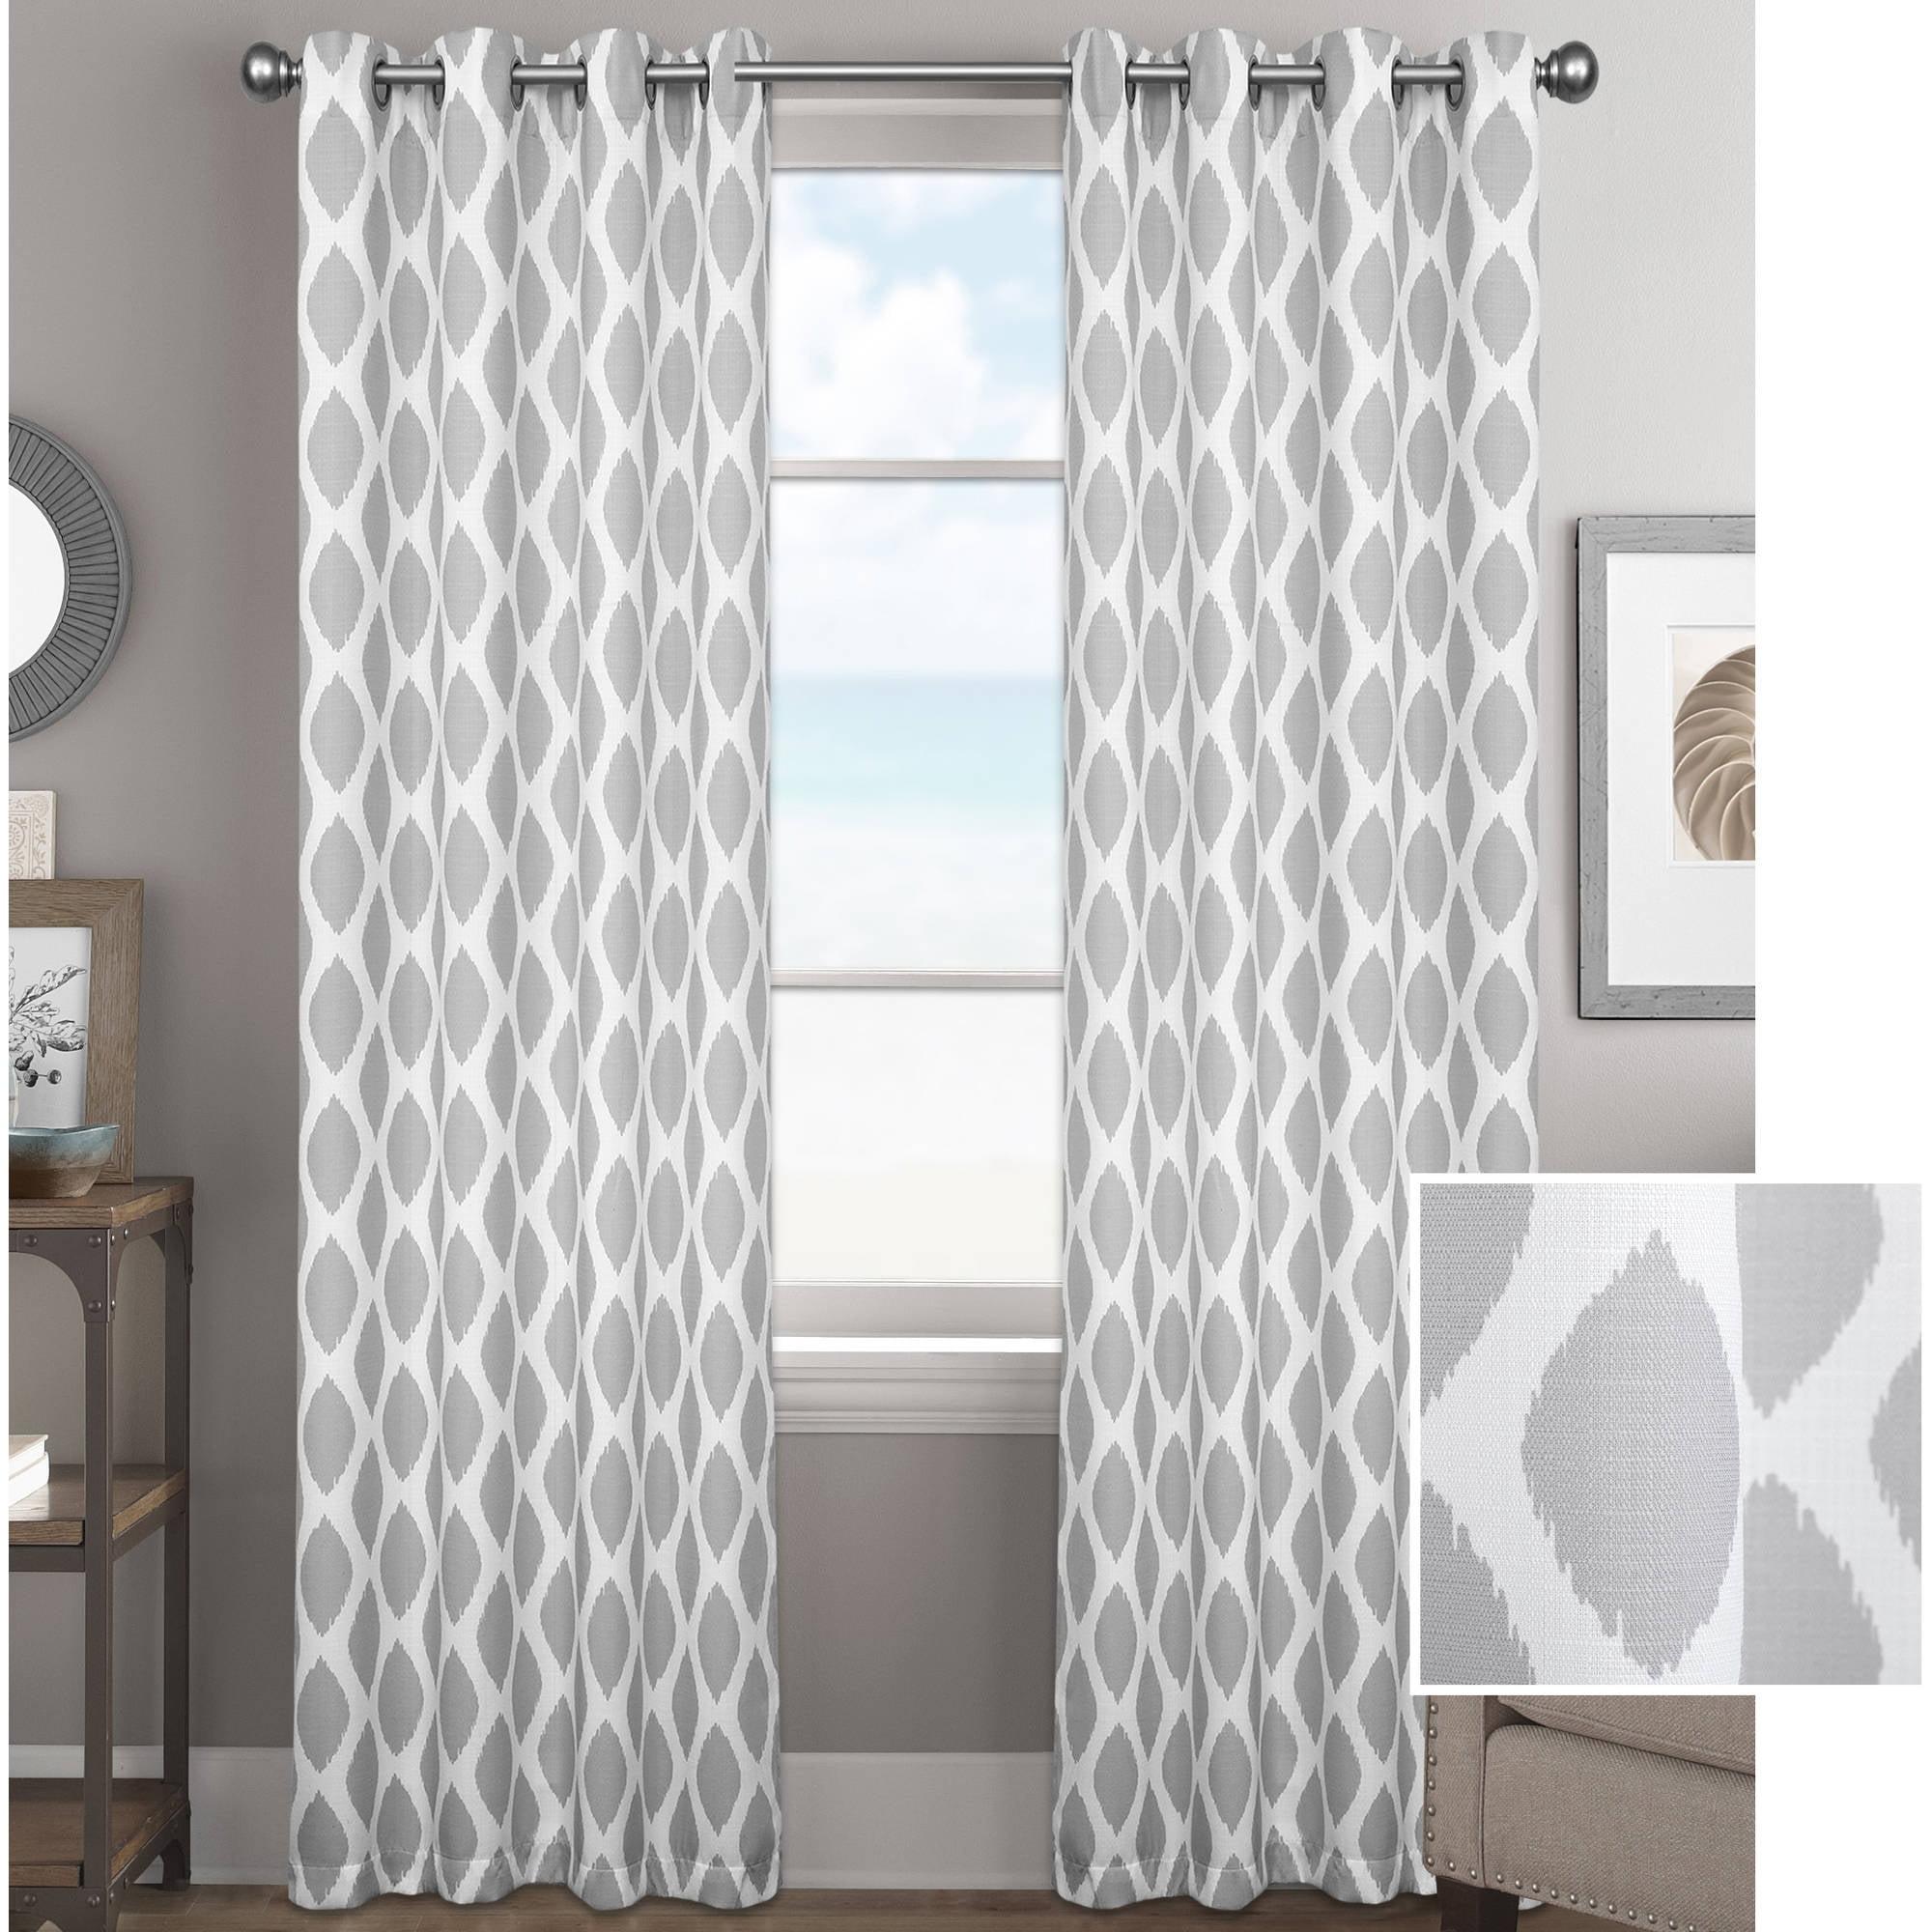 Well-liked Better Homes and Gardens Ikat Diamonds Curtain Panel - Walmart.com TS88